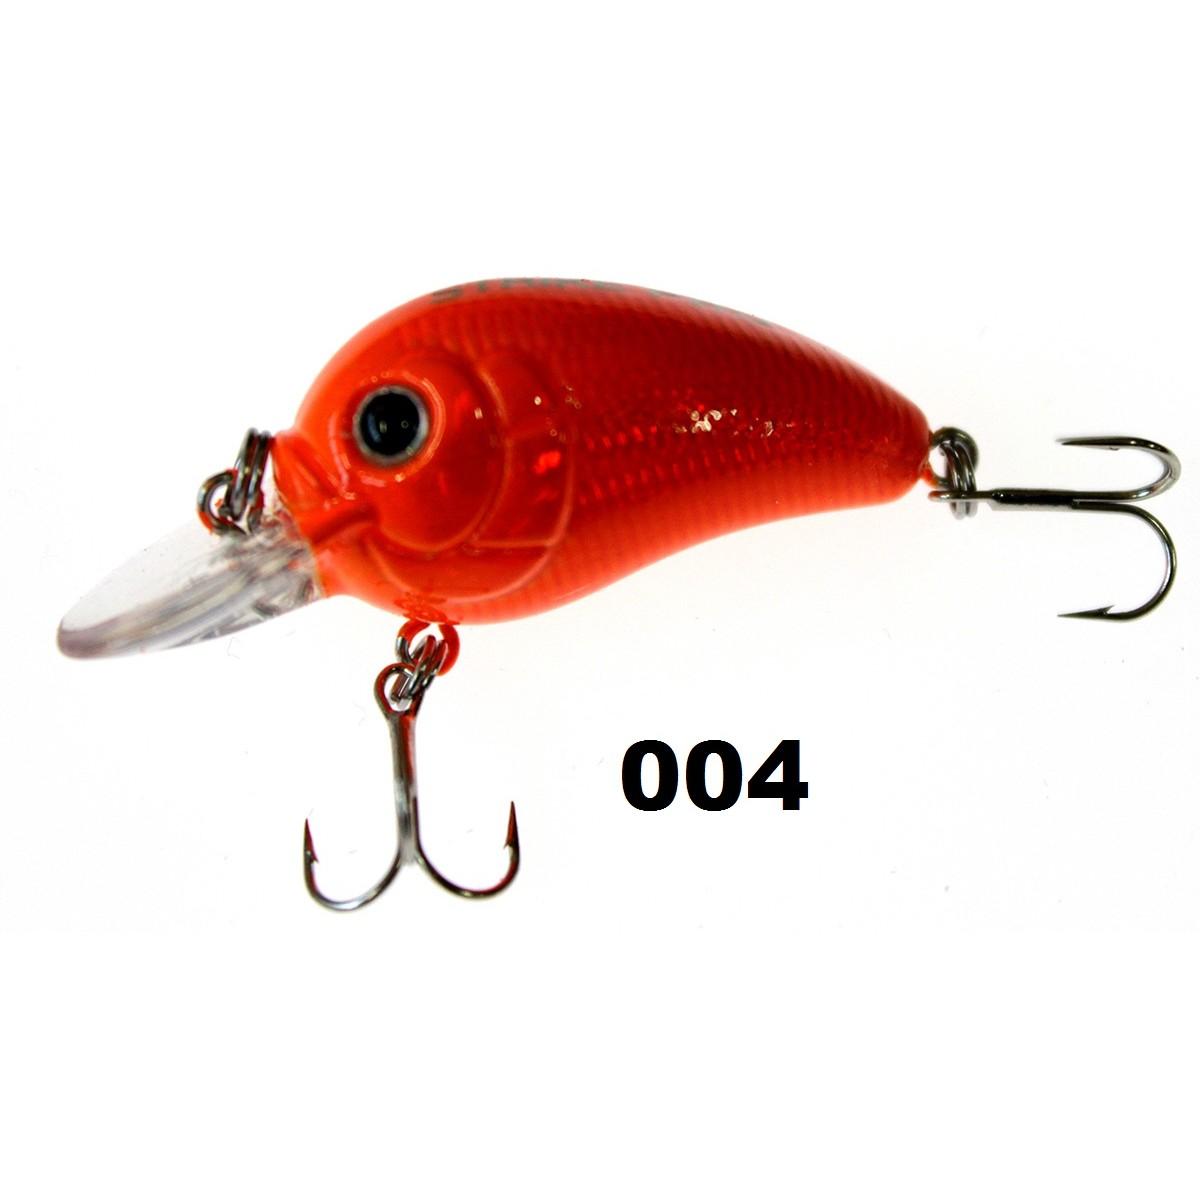 воблер, Strike Pro Baby Pro SP-088-004